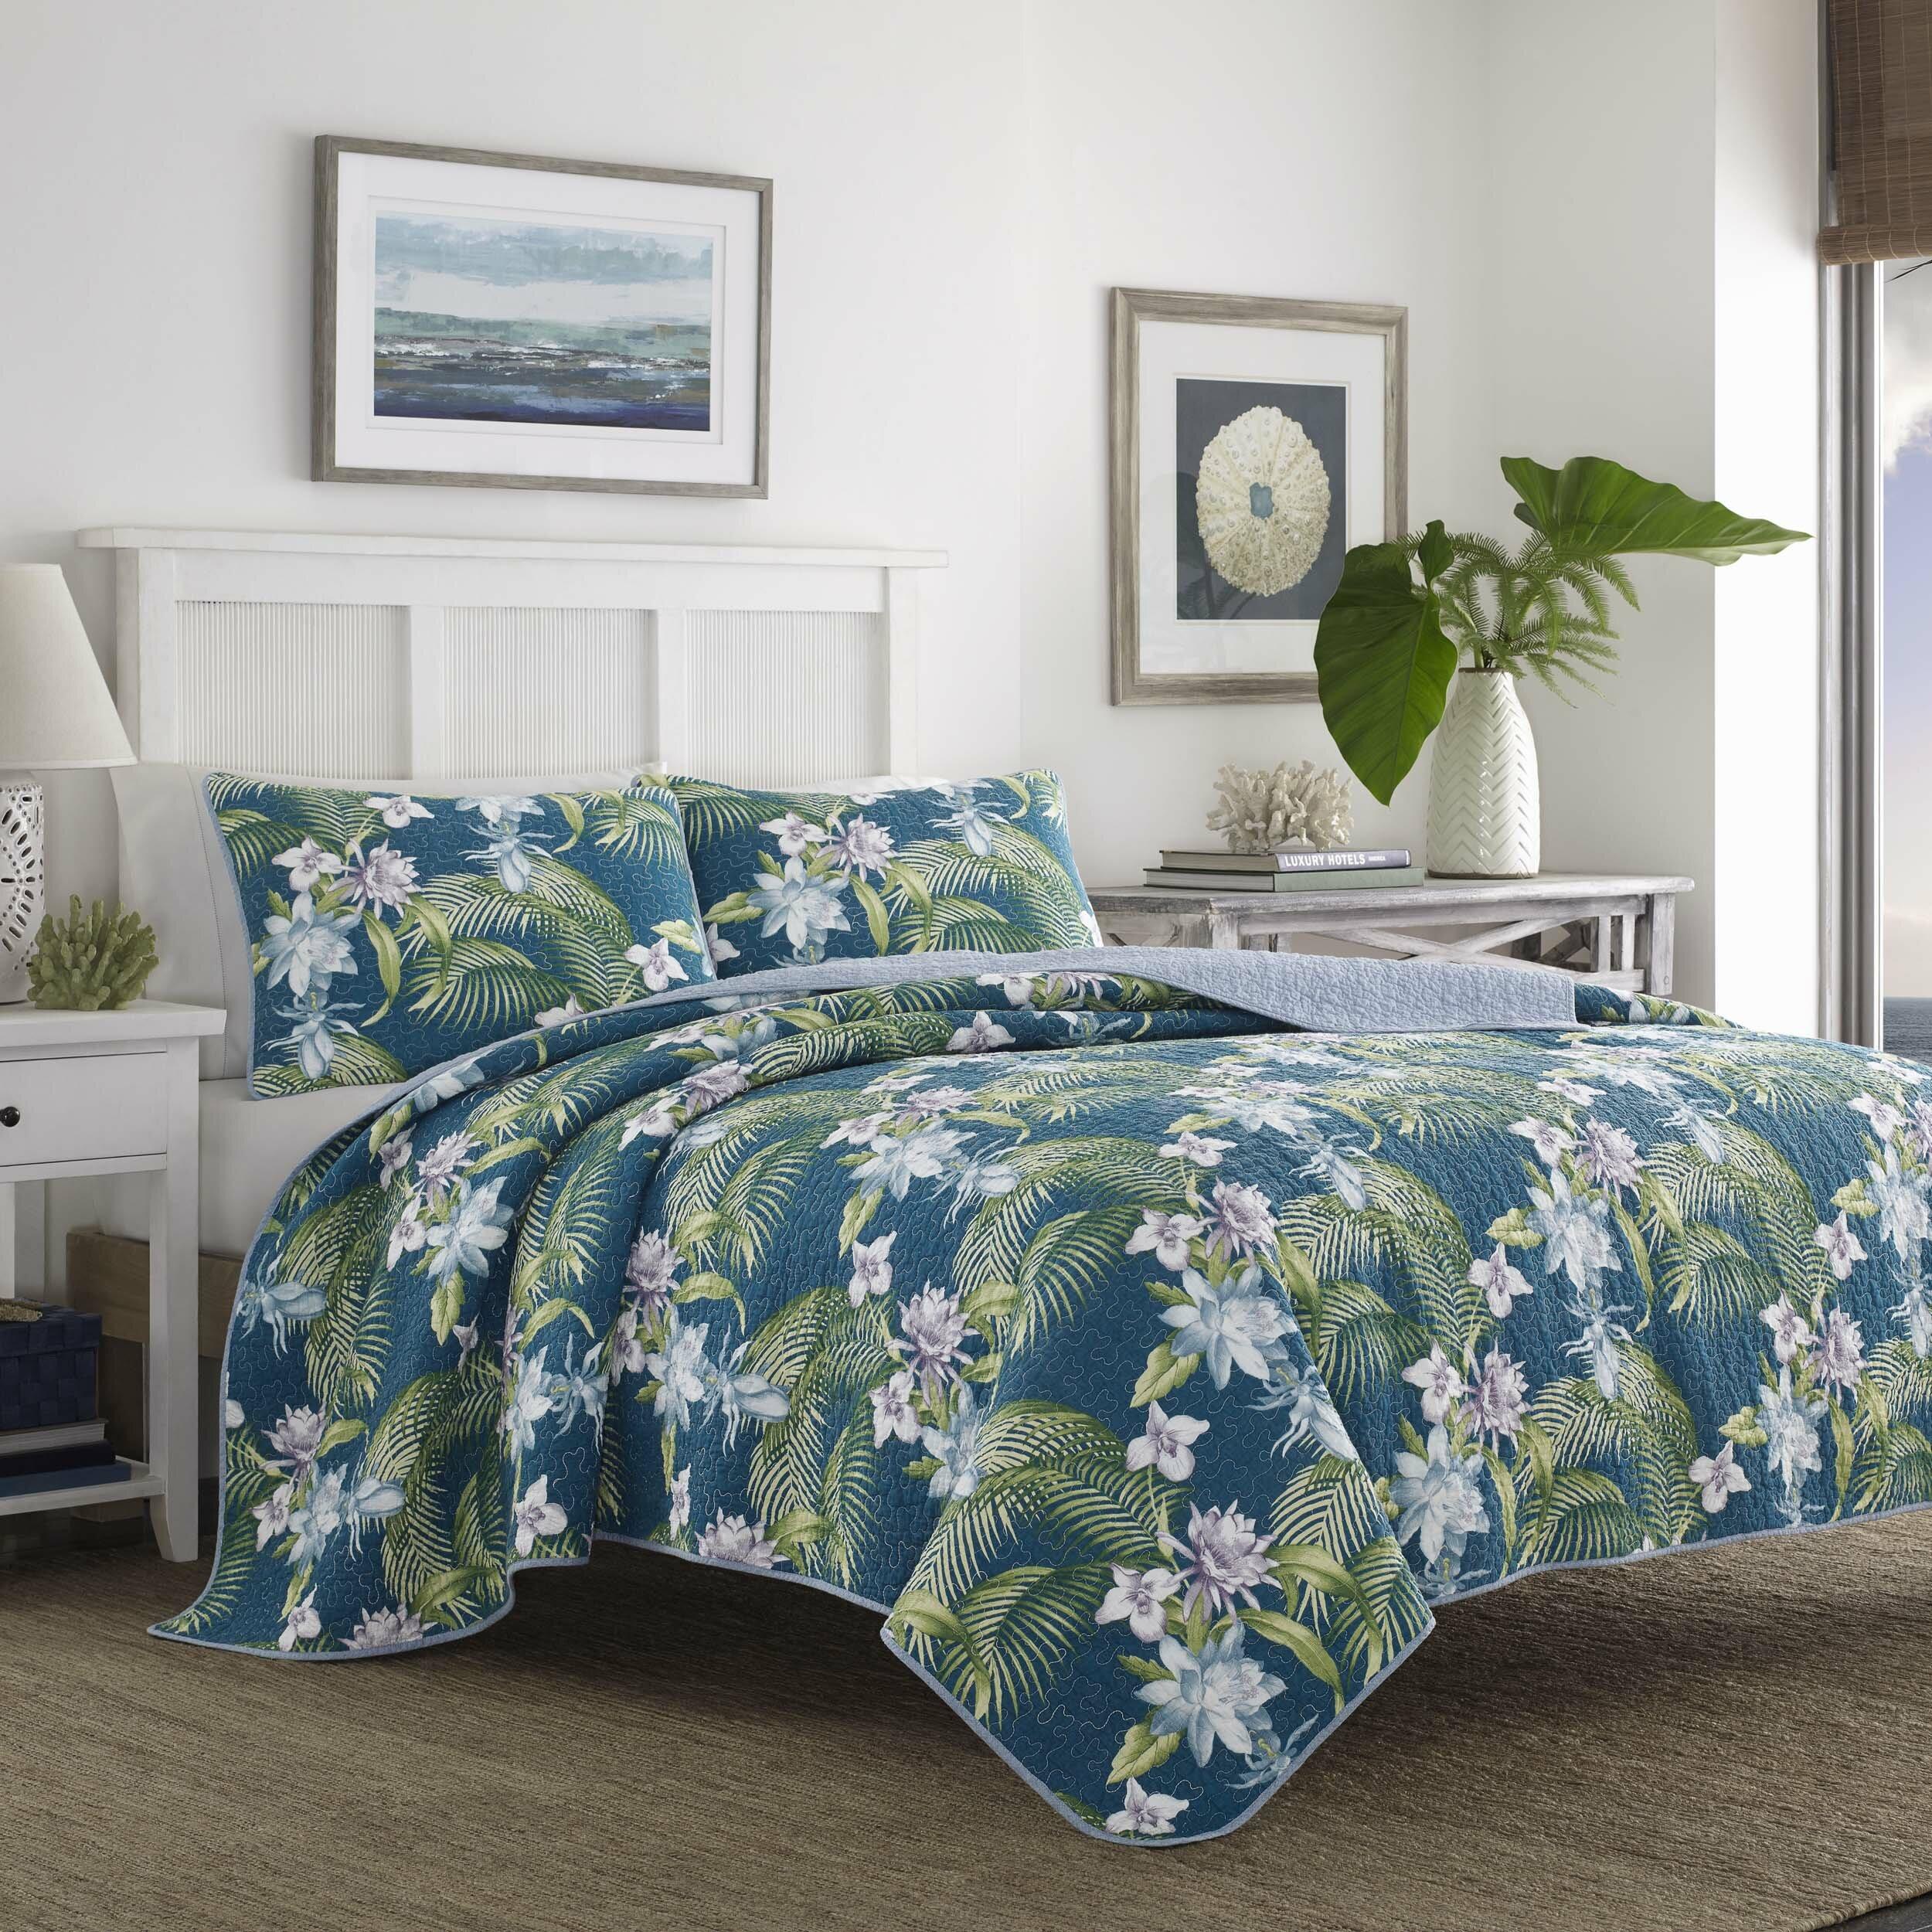 bedding quilt bohemian comforter comforters boho cotton reversible moroccan shams blue green set products mandala